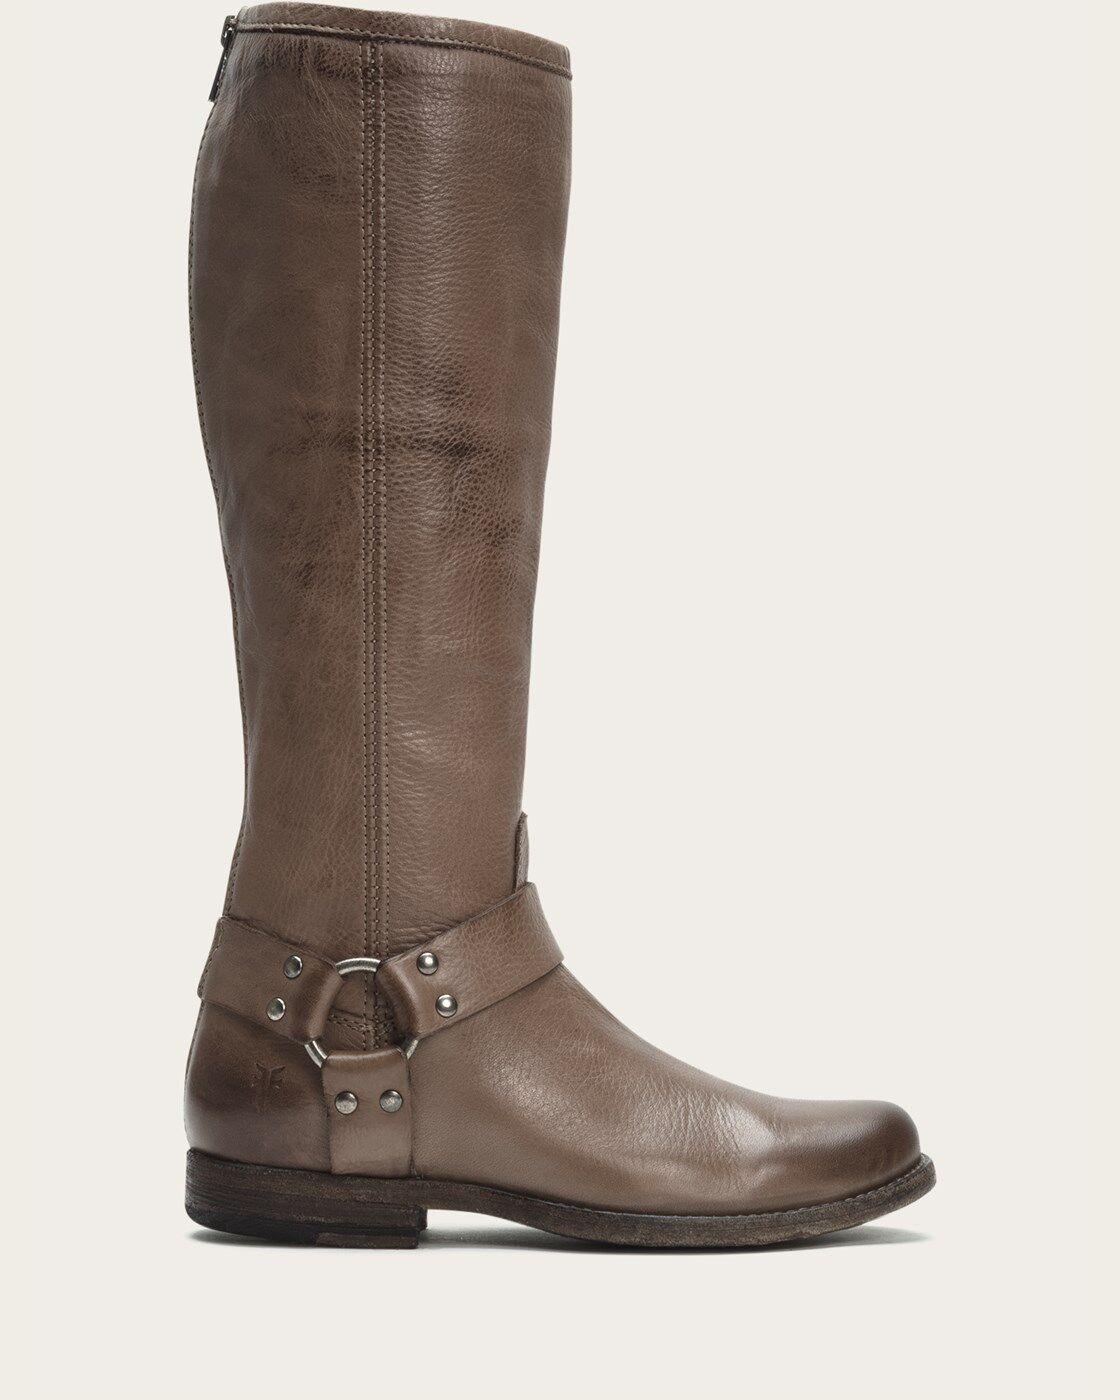 Frye Phillip Harness Tall Mujer Mujer Mujer gris bota 7566 Talla. 5.5B  barato y de alta calidad